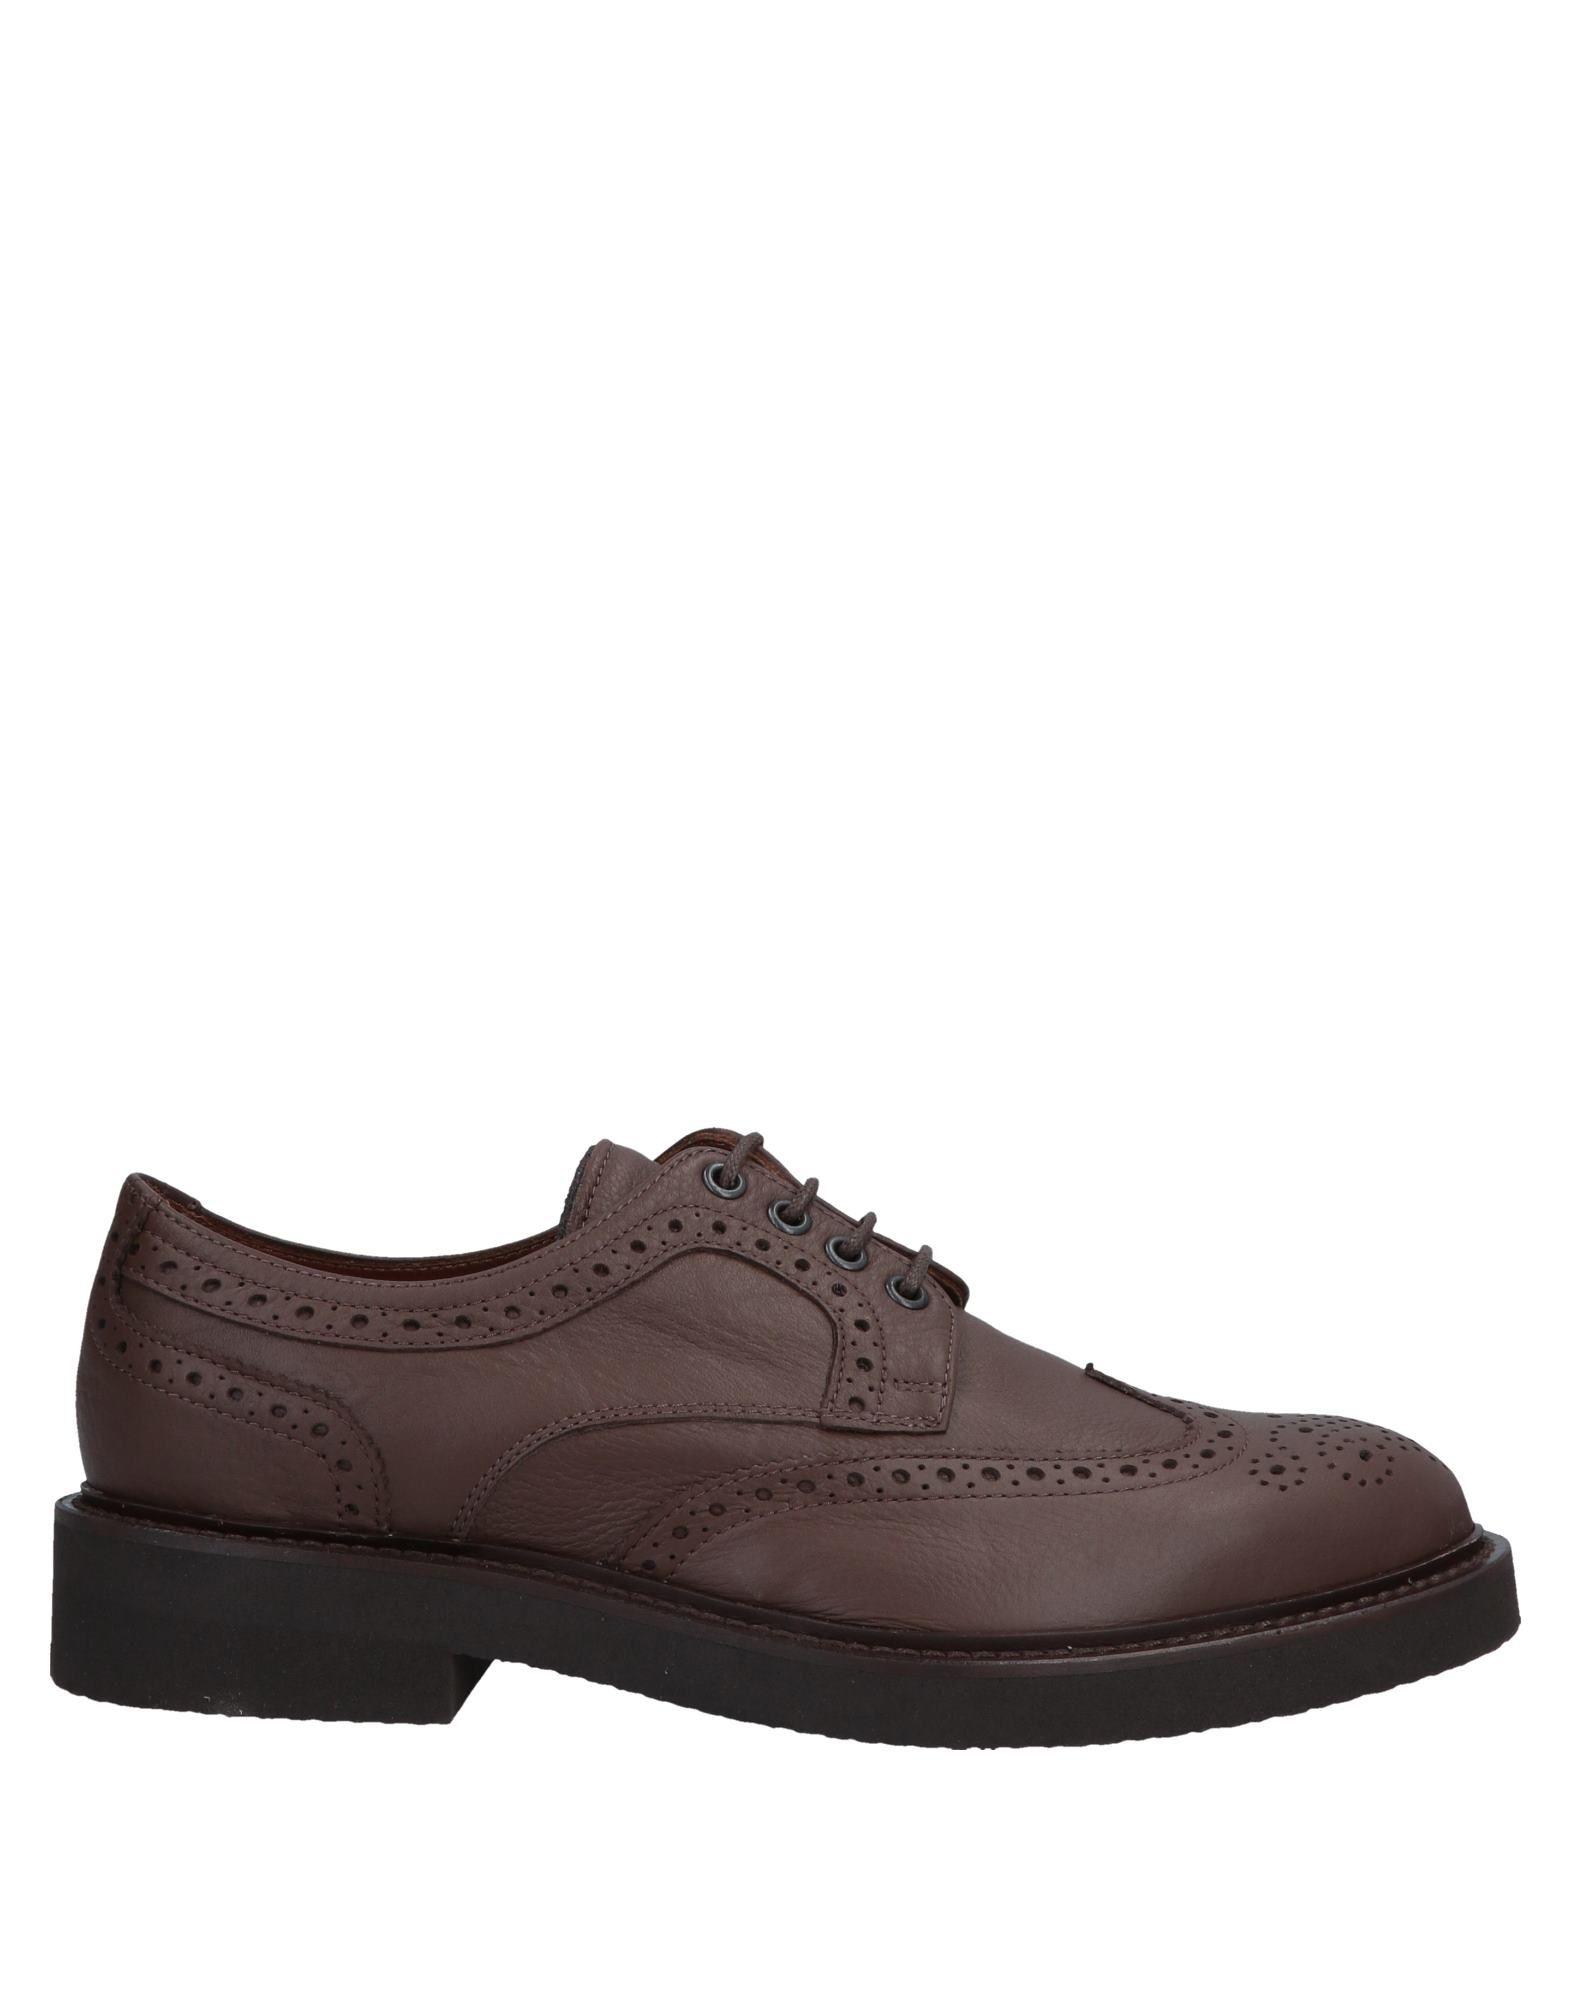 ELEVENTY Обувь на шнурках первый внутри обувь обувь обувь обувь обувь обувь обувь обувь обувь 8a2549 мужская армия green 40 метров